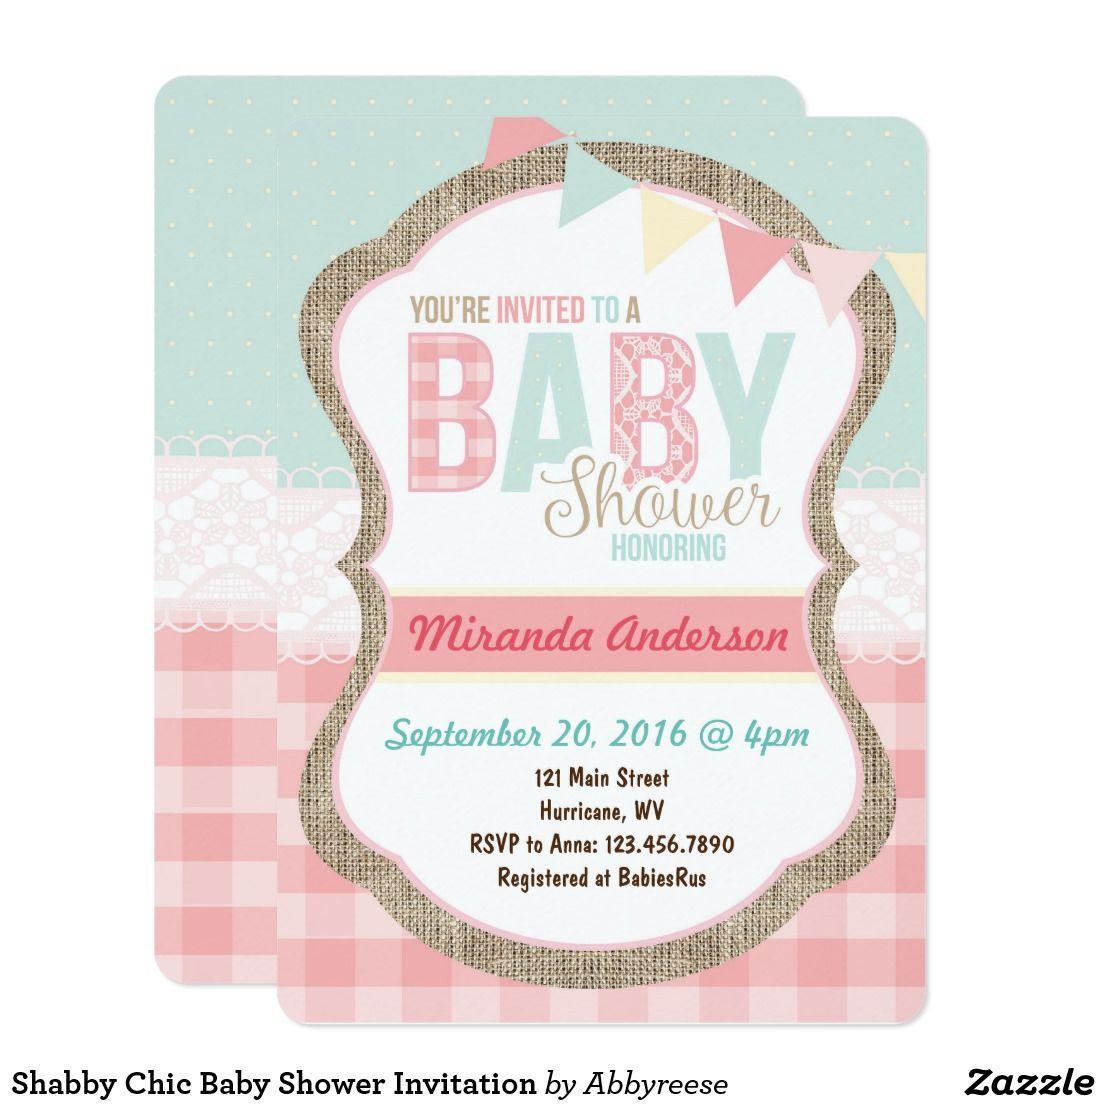 Shabby Chic Baby Shower Invitation | Shabby chic baby shower, Chic ...